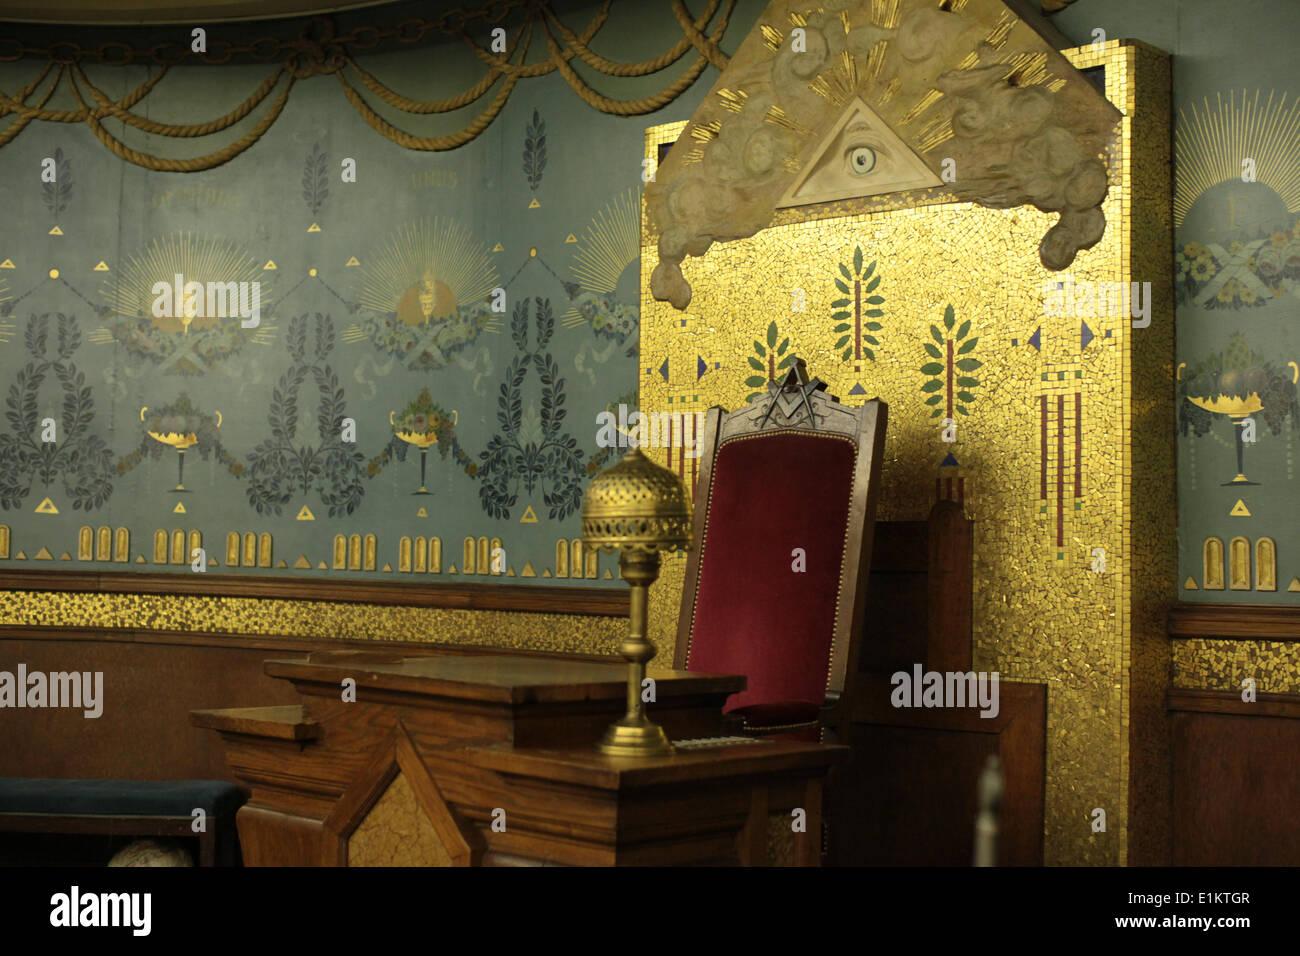 The Grand Orient de France (GODF).  Masonic lodge. - Stock Image